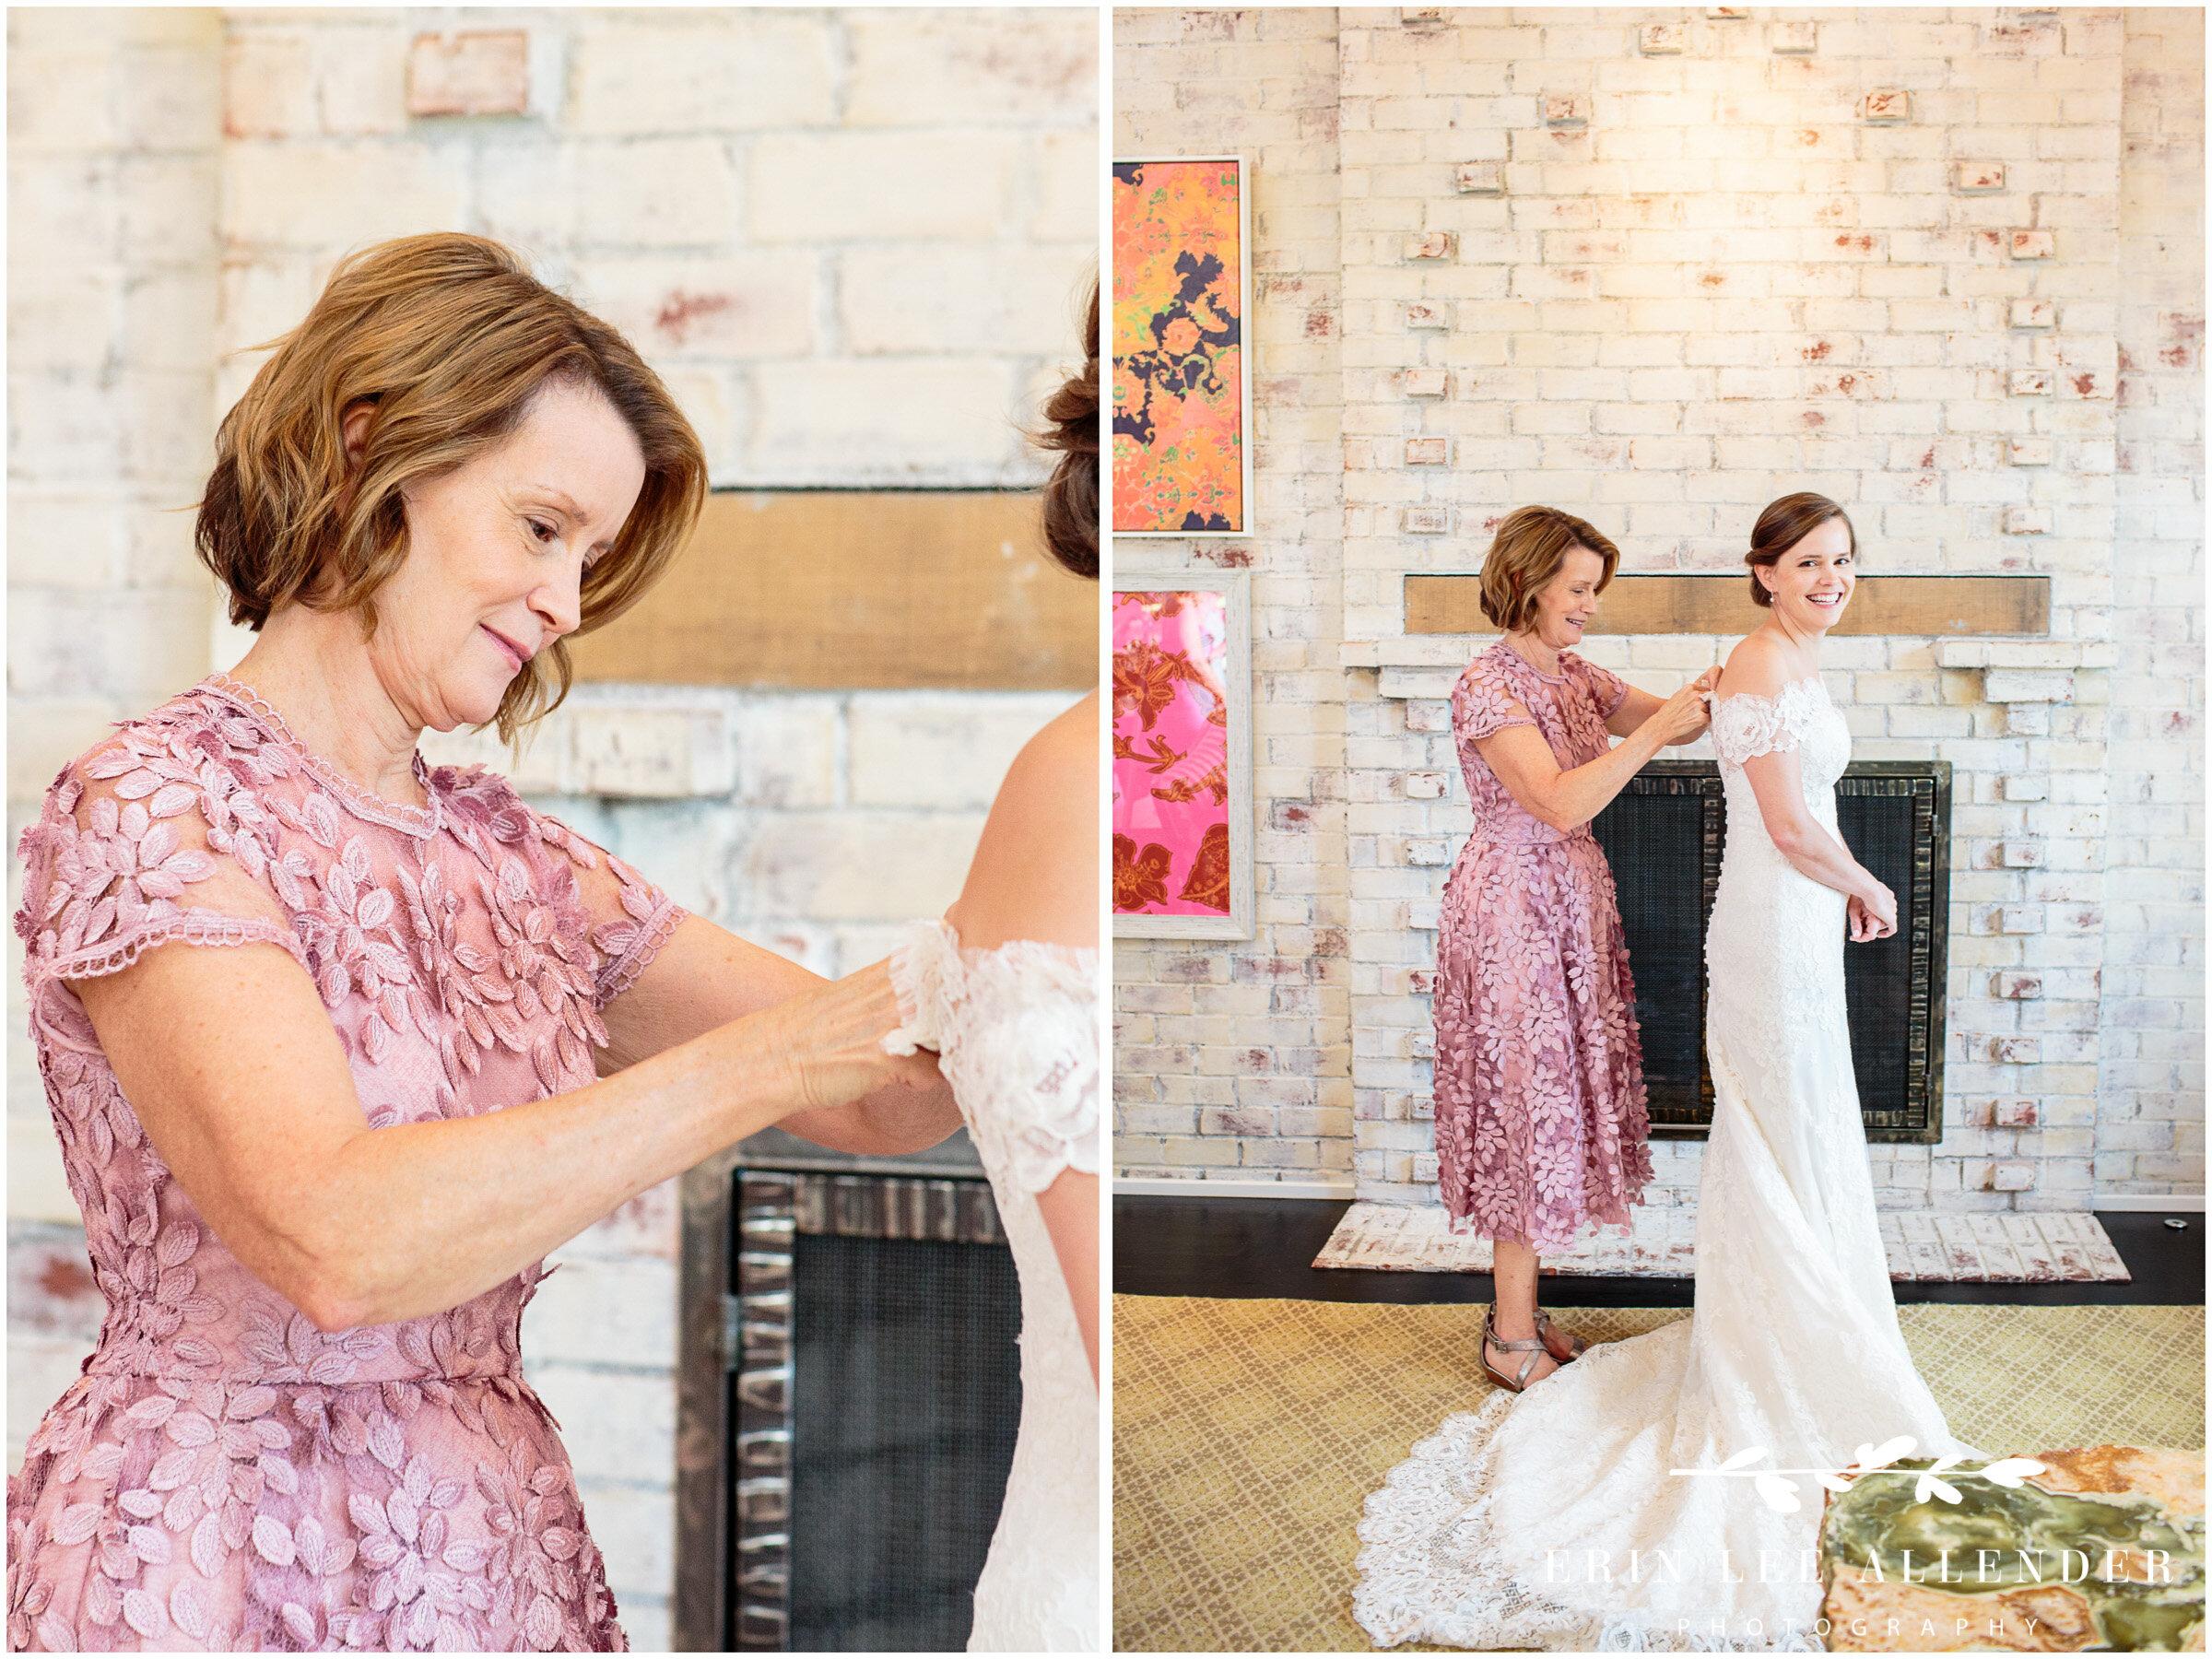 Bride-Getting-In-Wedding-Dress